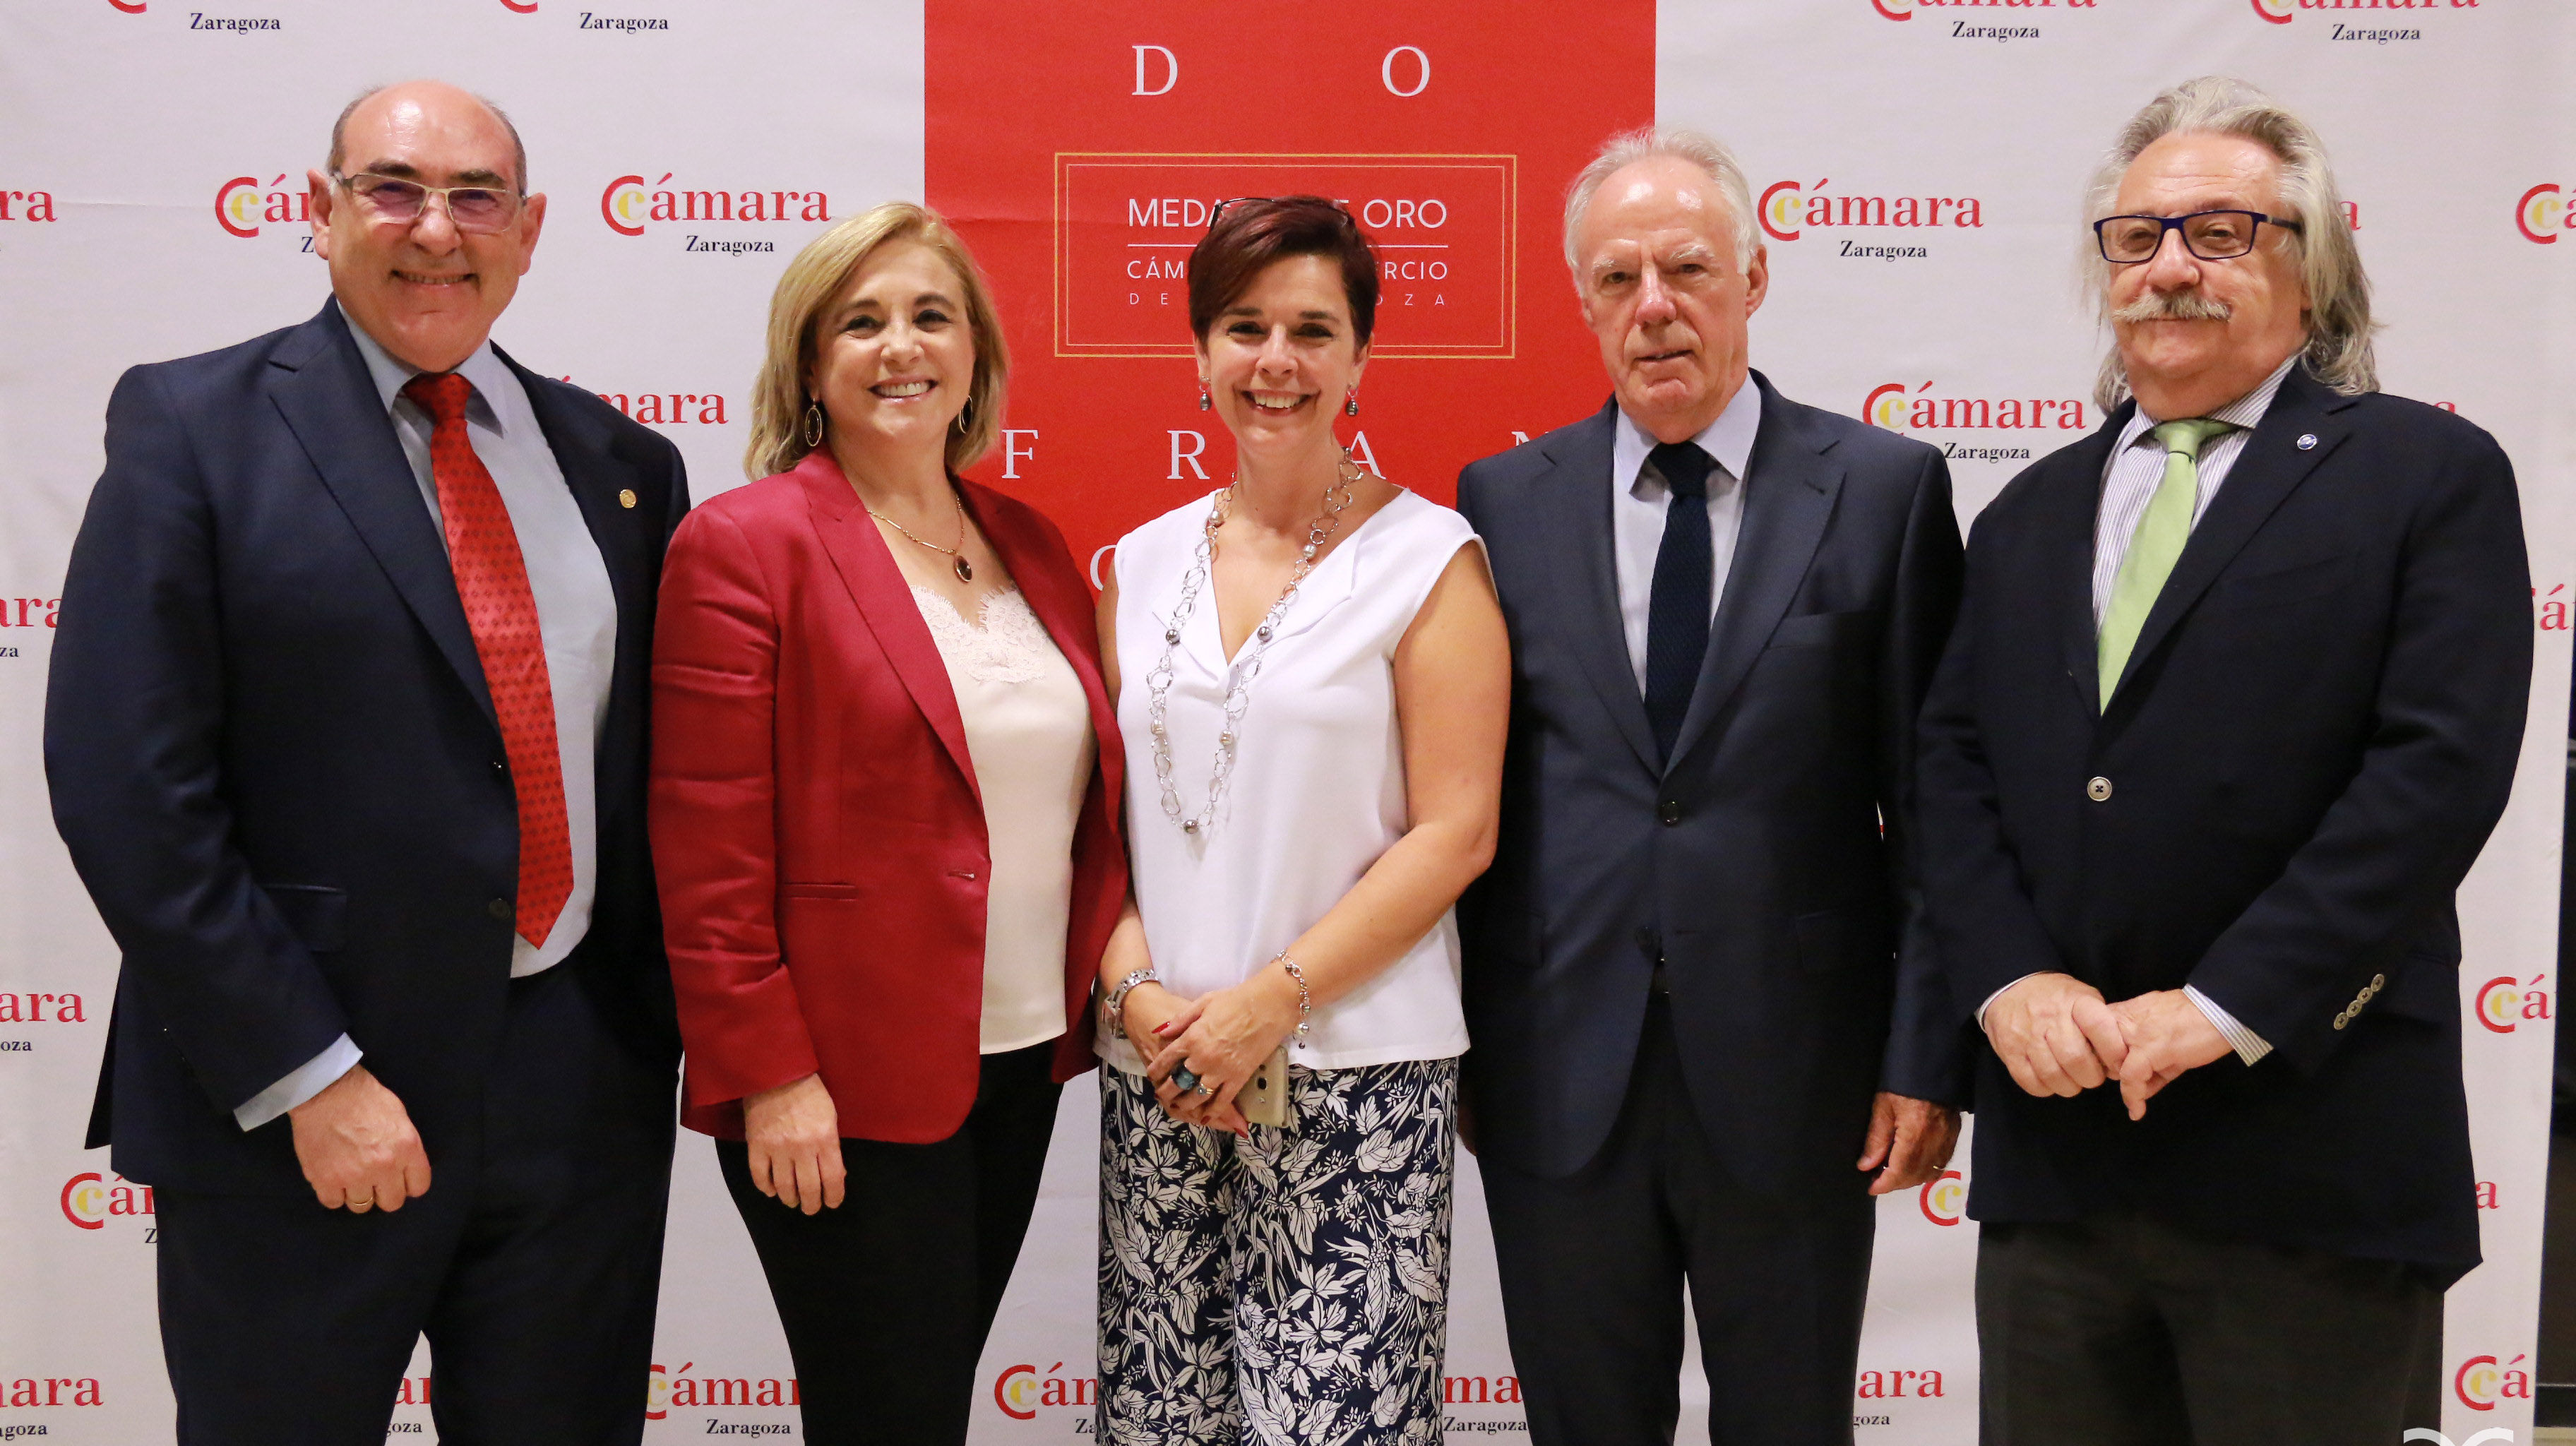 Juan Carlos Marín, Blanca Fernández-Galiano, , Pilar Fernández, Jose María Marín, Ángel Vela